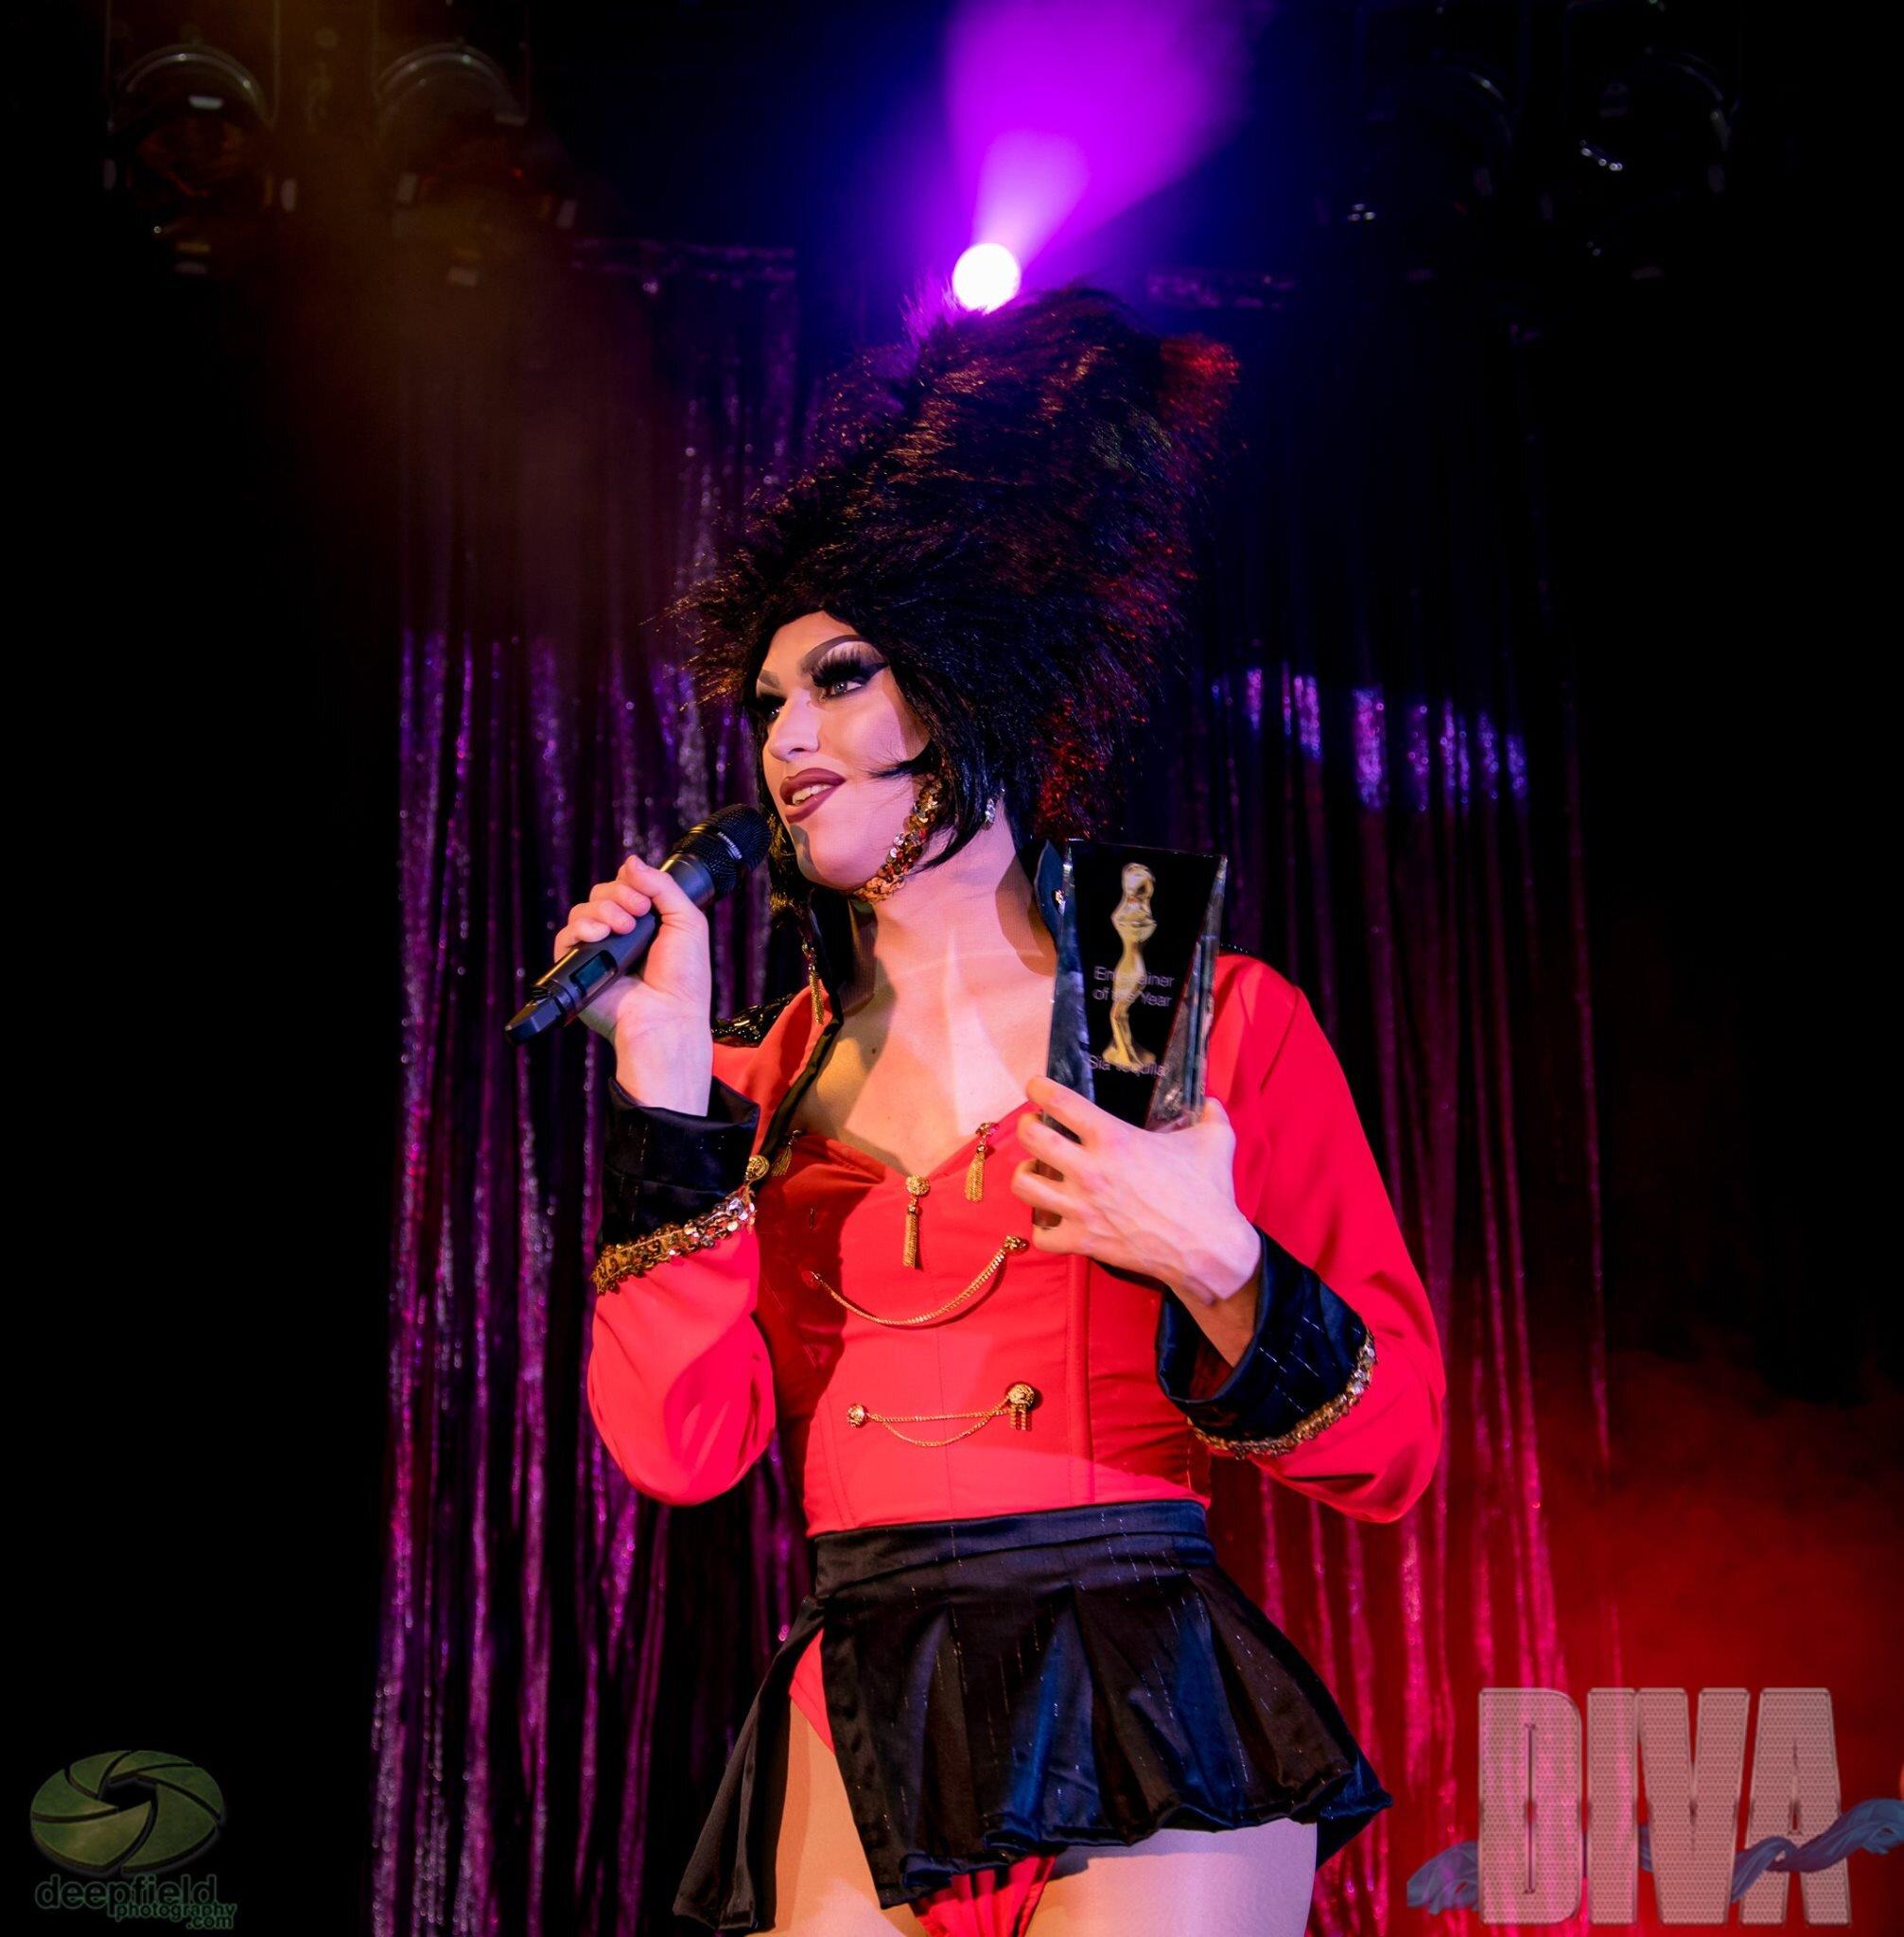 sia-tequila-winner-entertain-of-the-year-win-diva-awards-sydney-drag-queen-royalty-best-hire-drag-race-australia-2.jpg